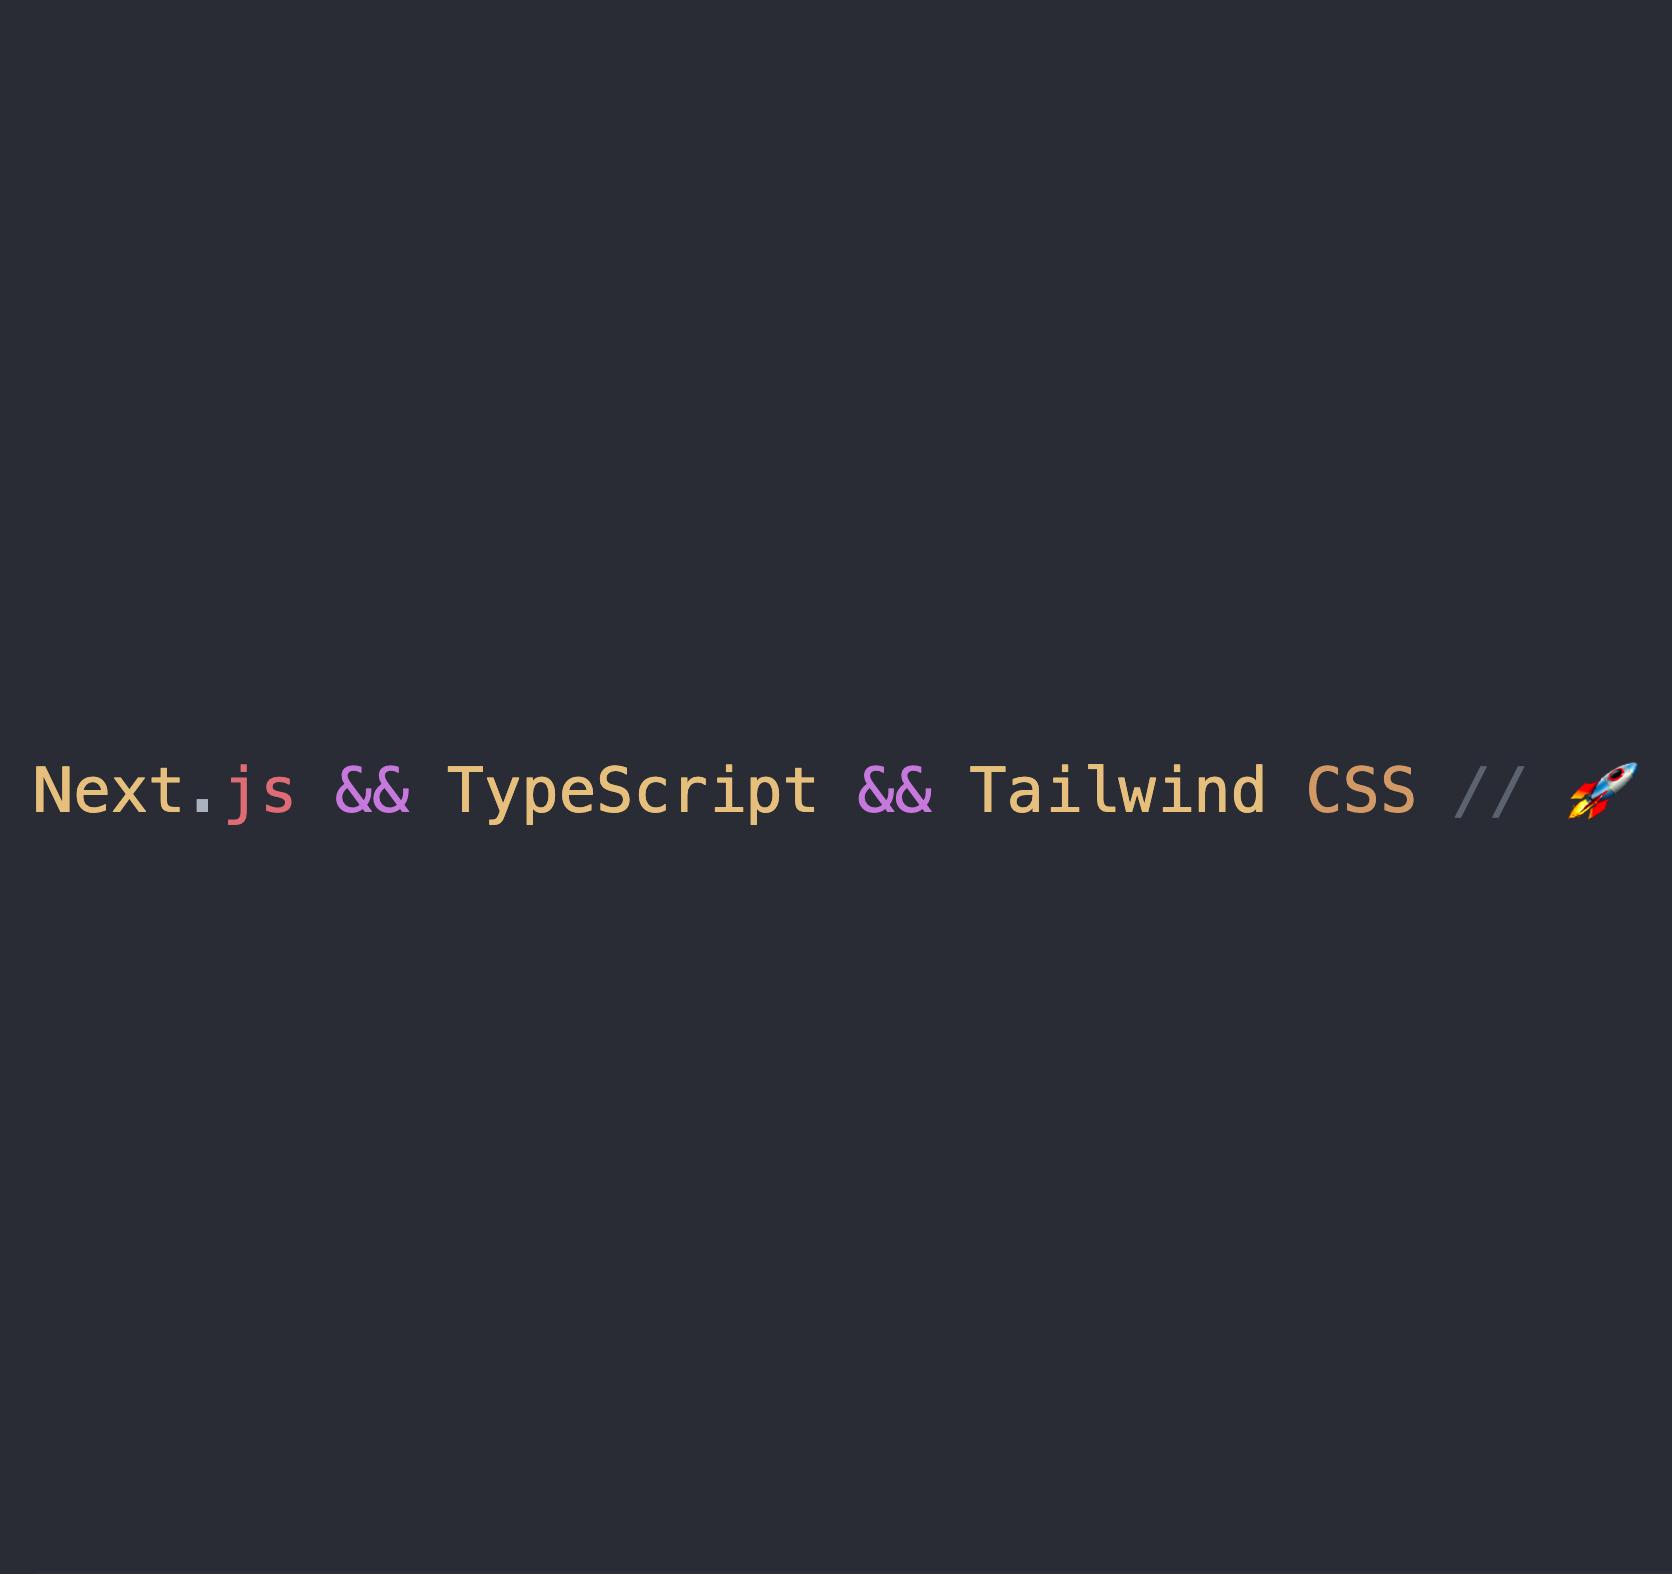 images/how-to-create-an-app-with-nextjs-typescript-tailwindcss-telmo.jpg